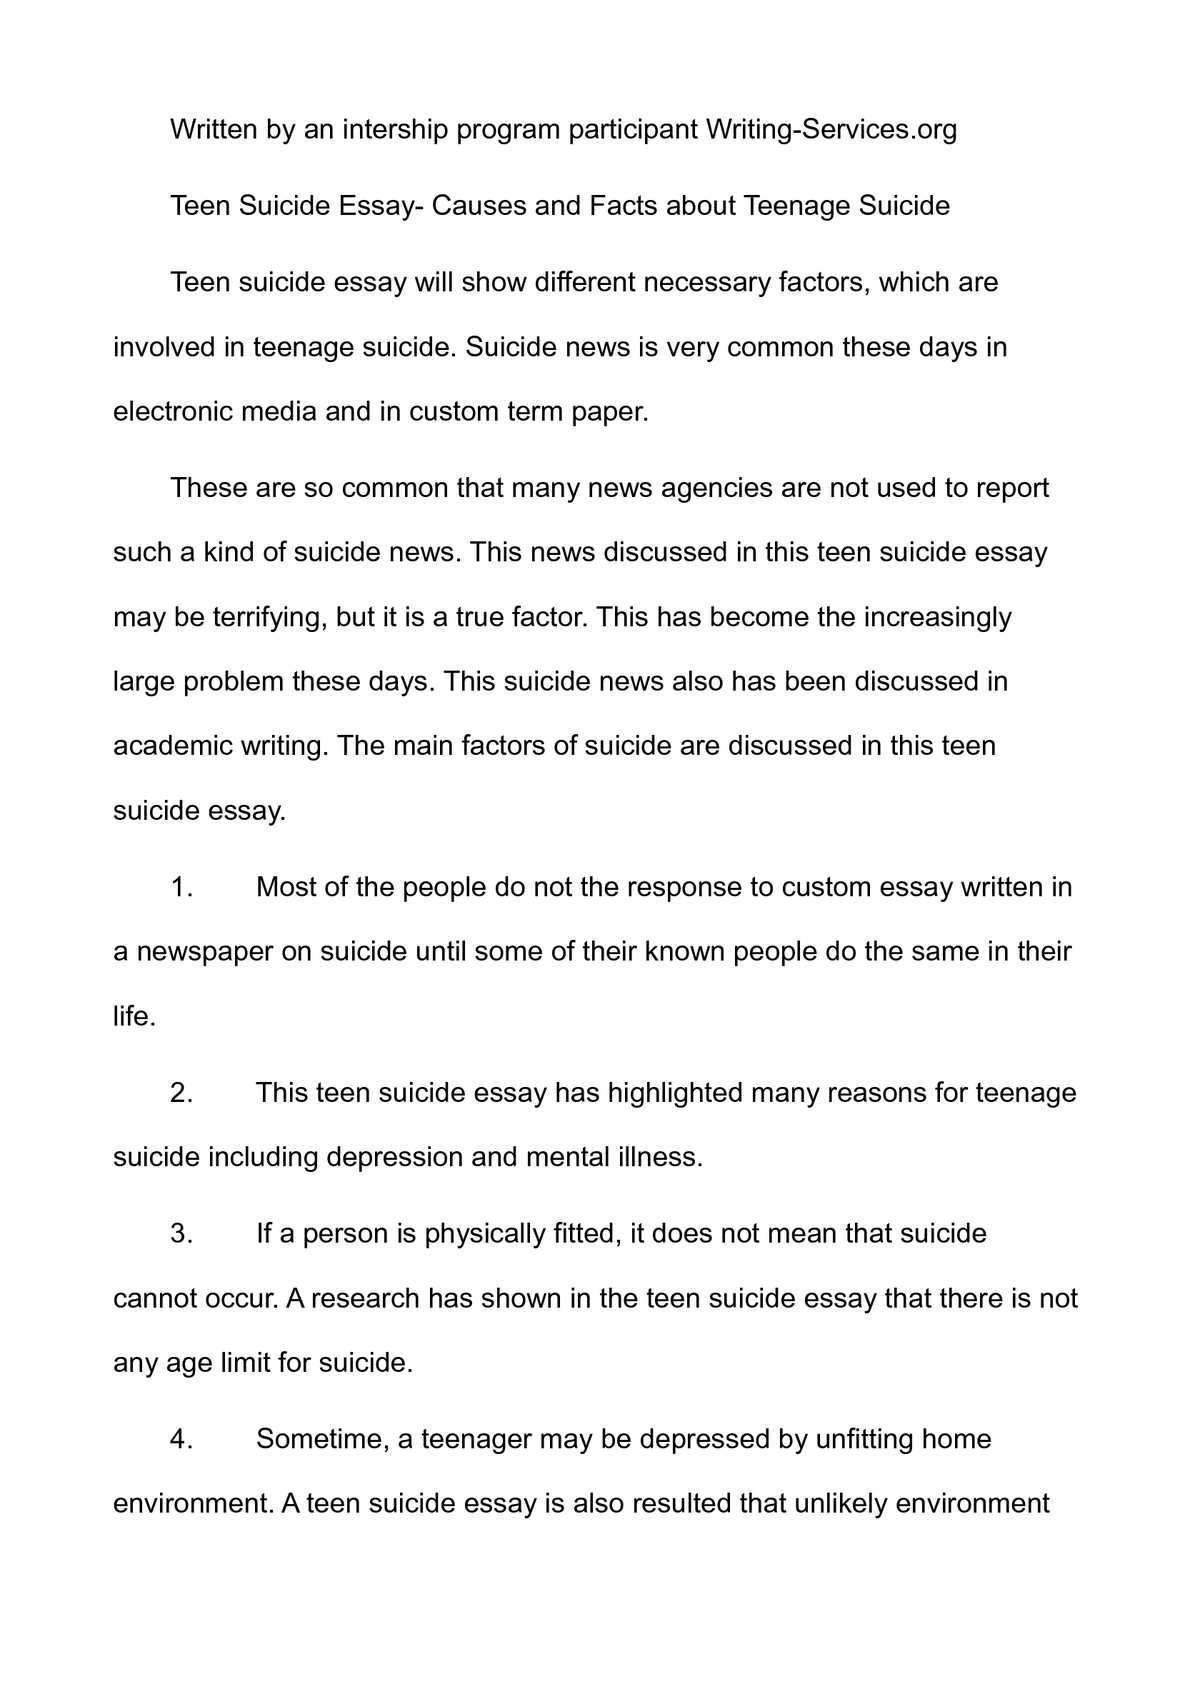 001 Teenage Suicide Essay P1 Beautiful Research Essays Pdf Full